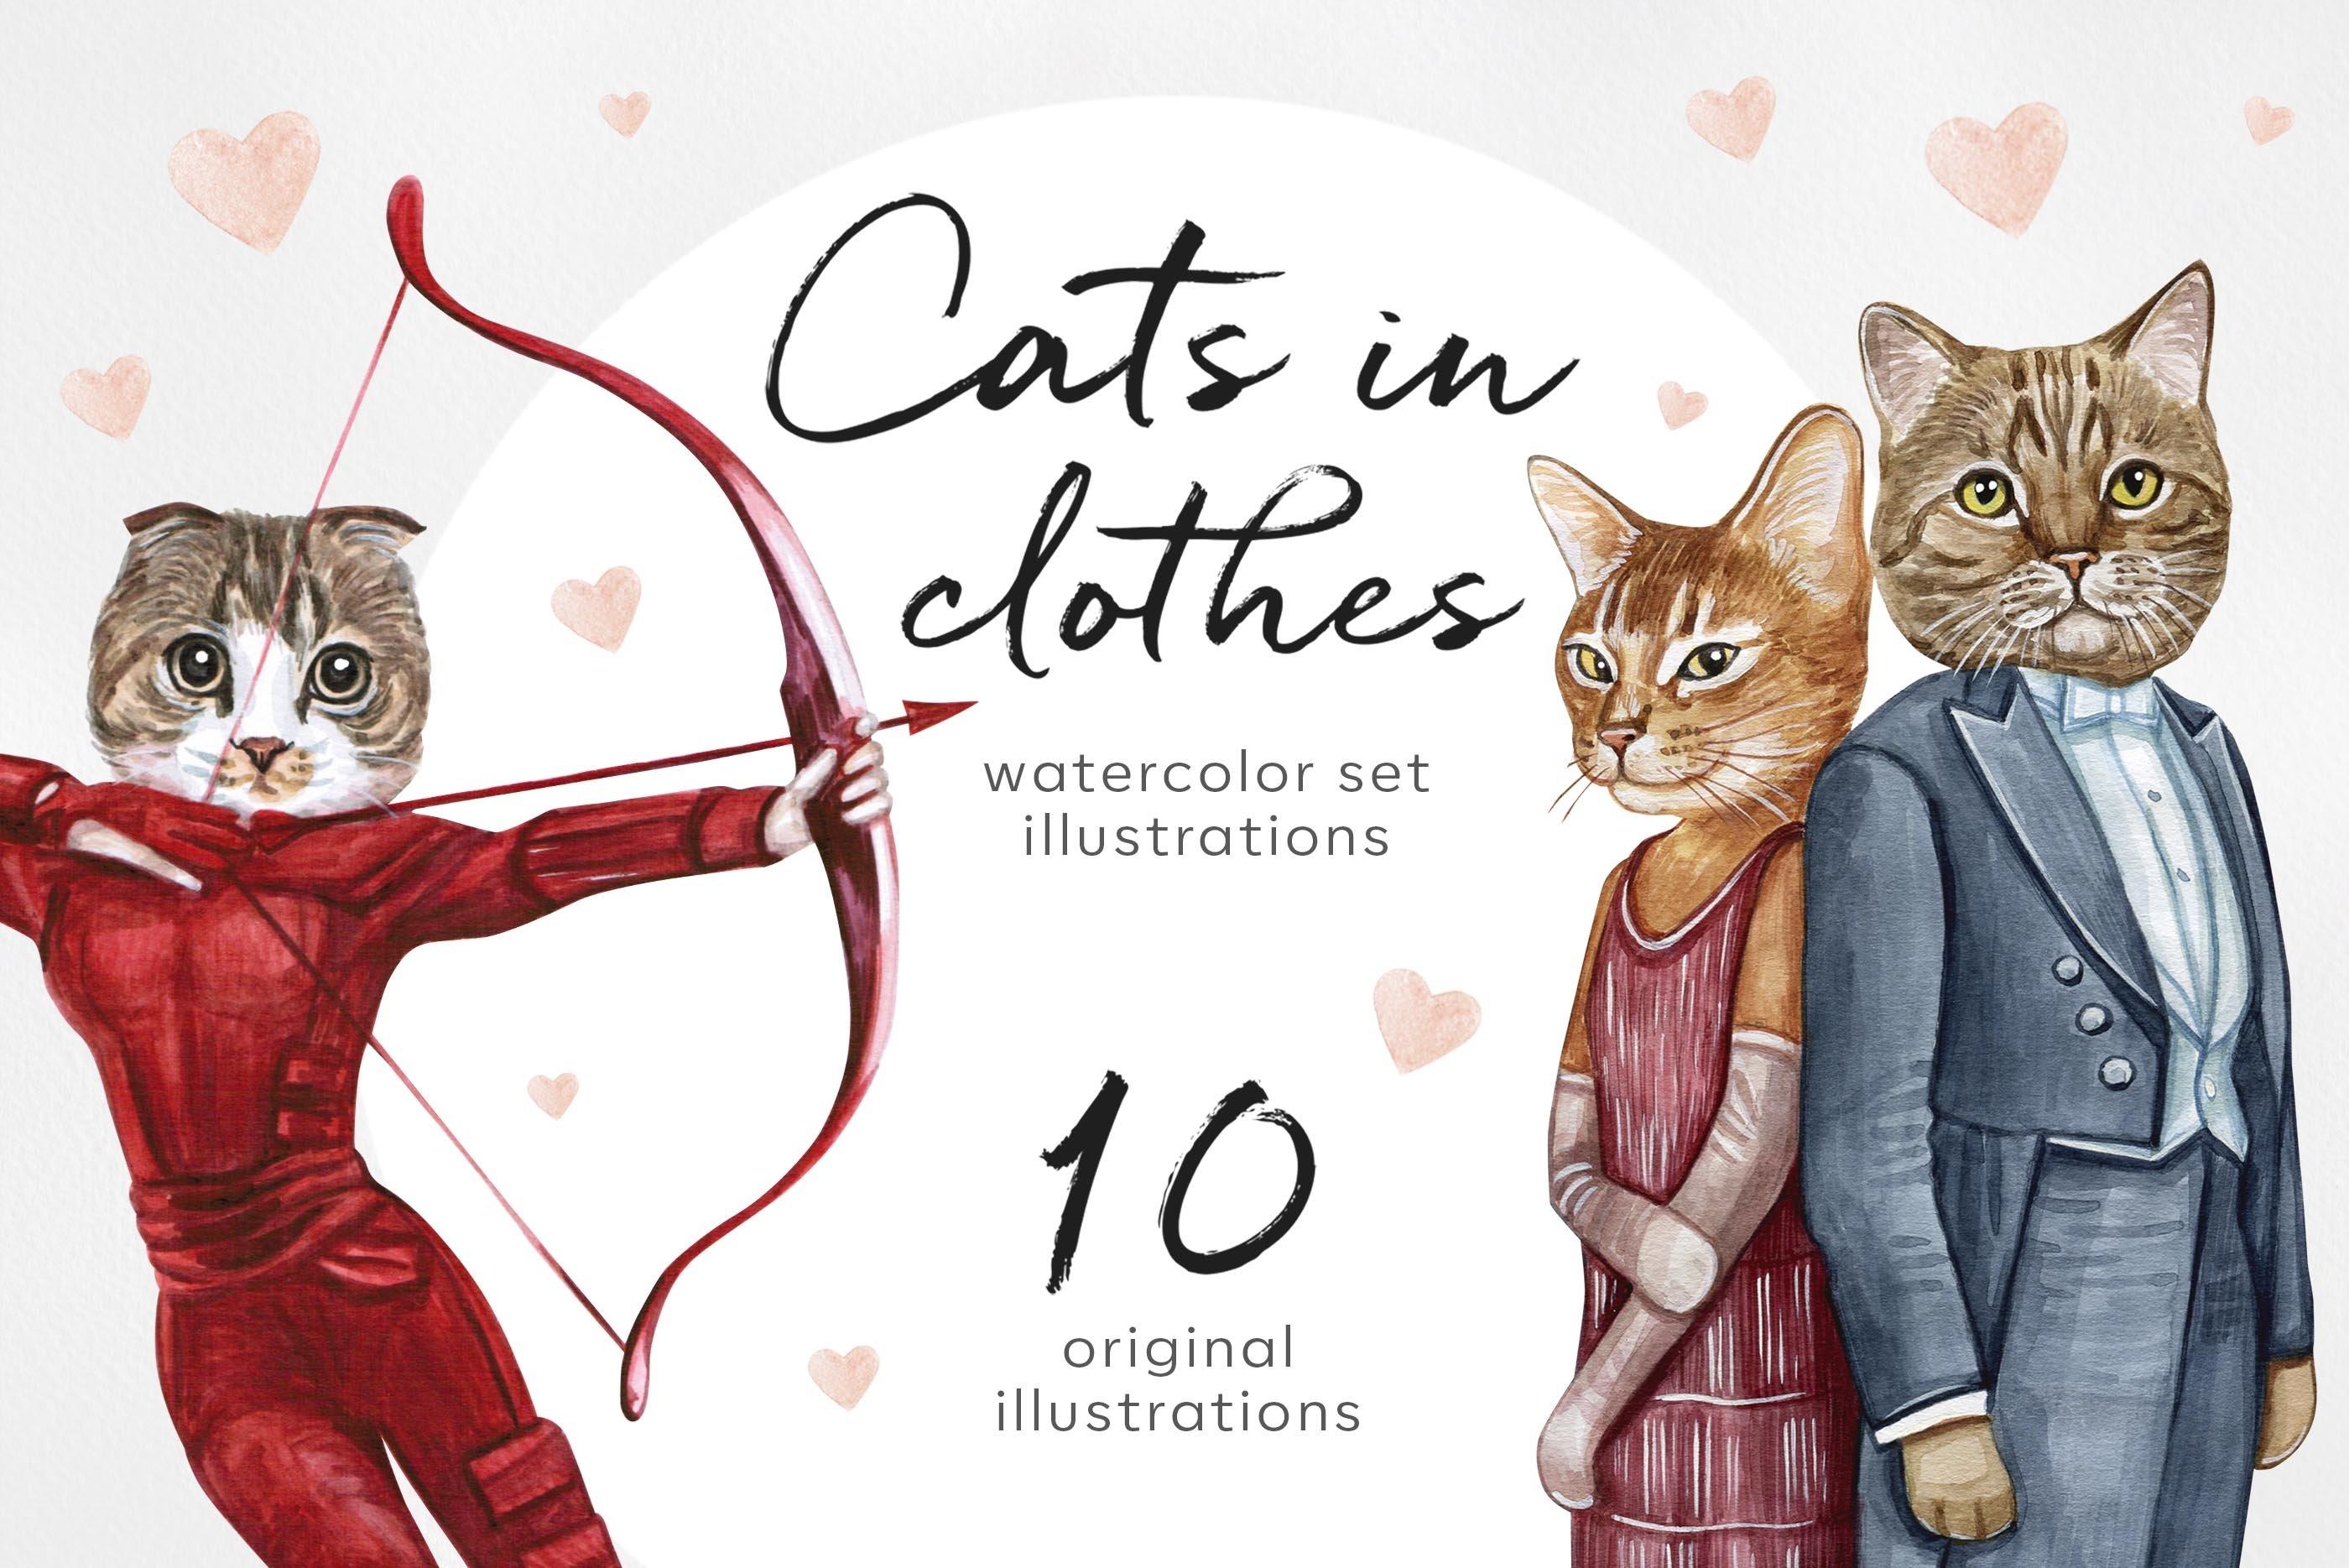 Cat in clothe. Watercolor set 10 exclusive cat illustrations